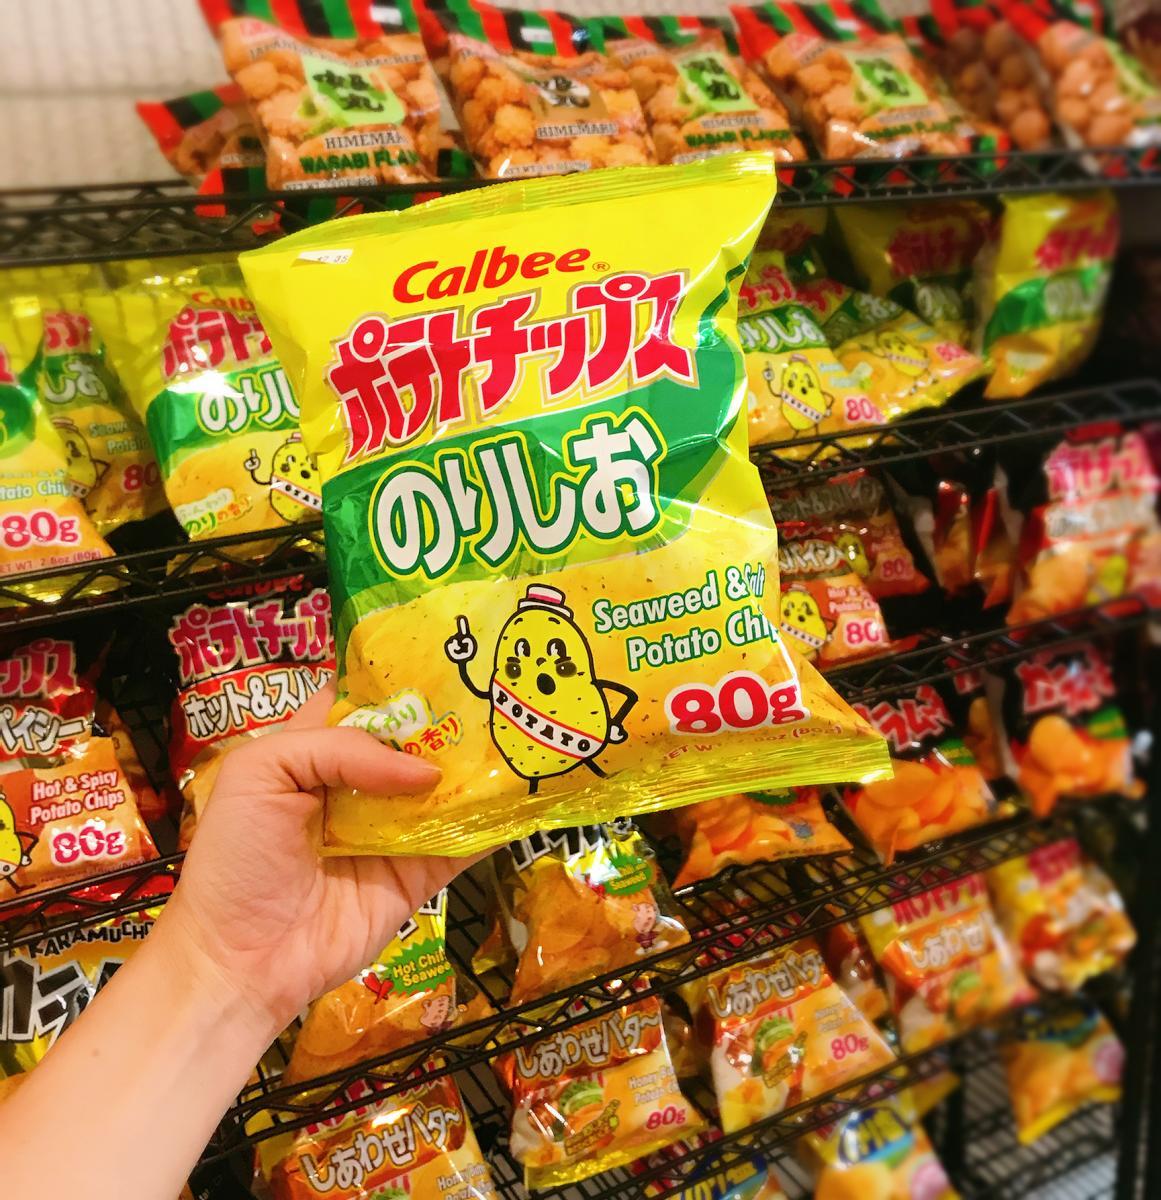 A-Tan Asian Market (1)